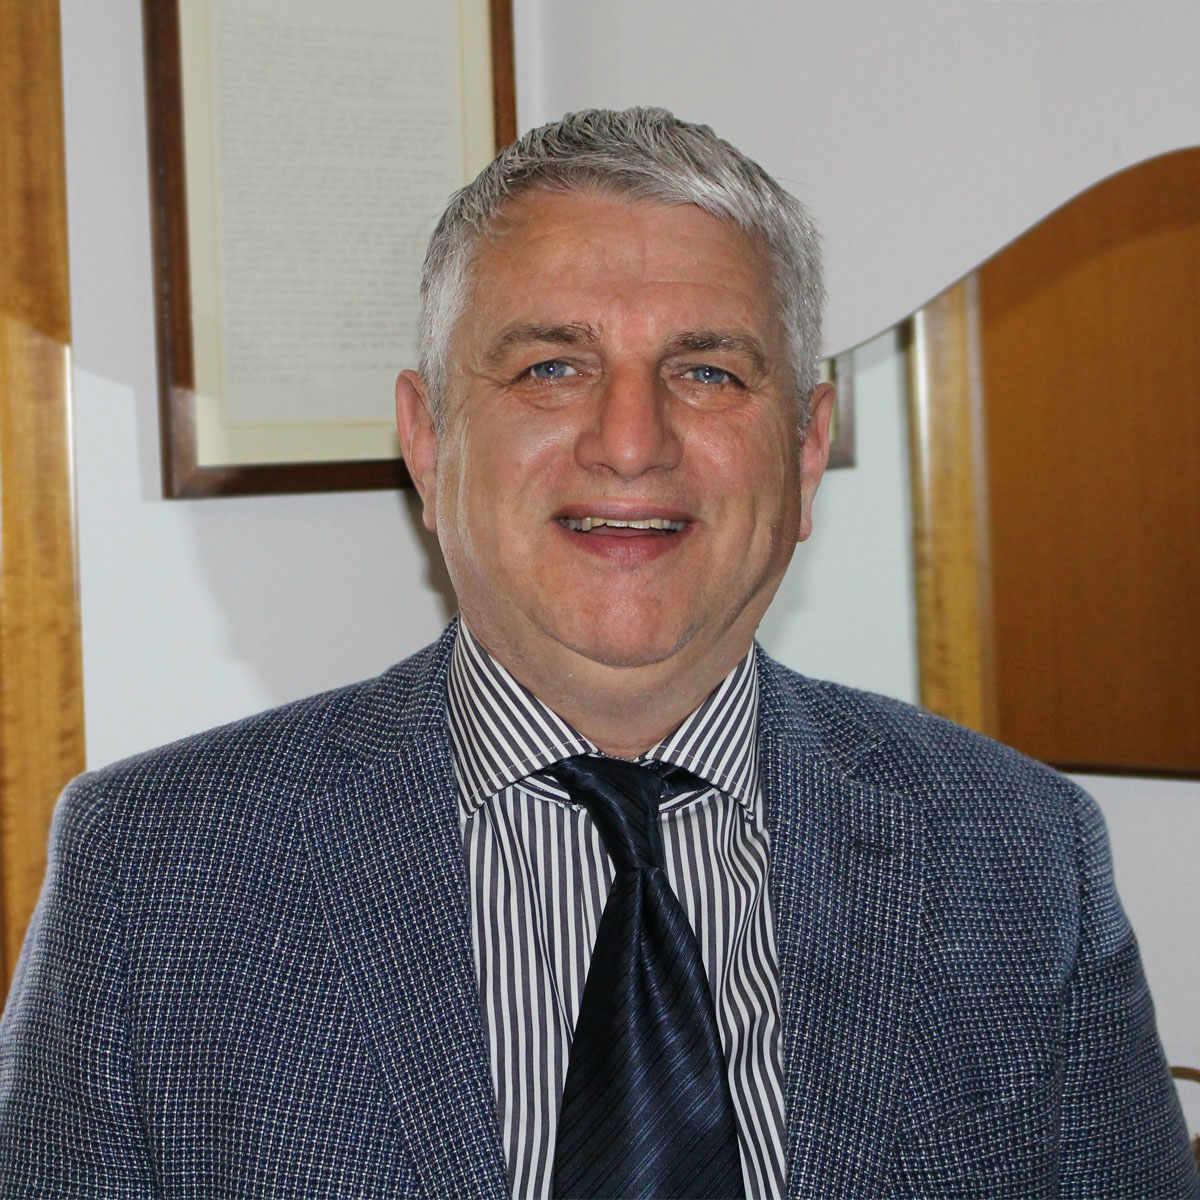 Gianluigi Pellizzari, Fondatore e A.D.